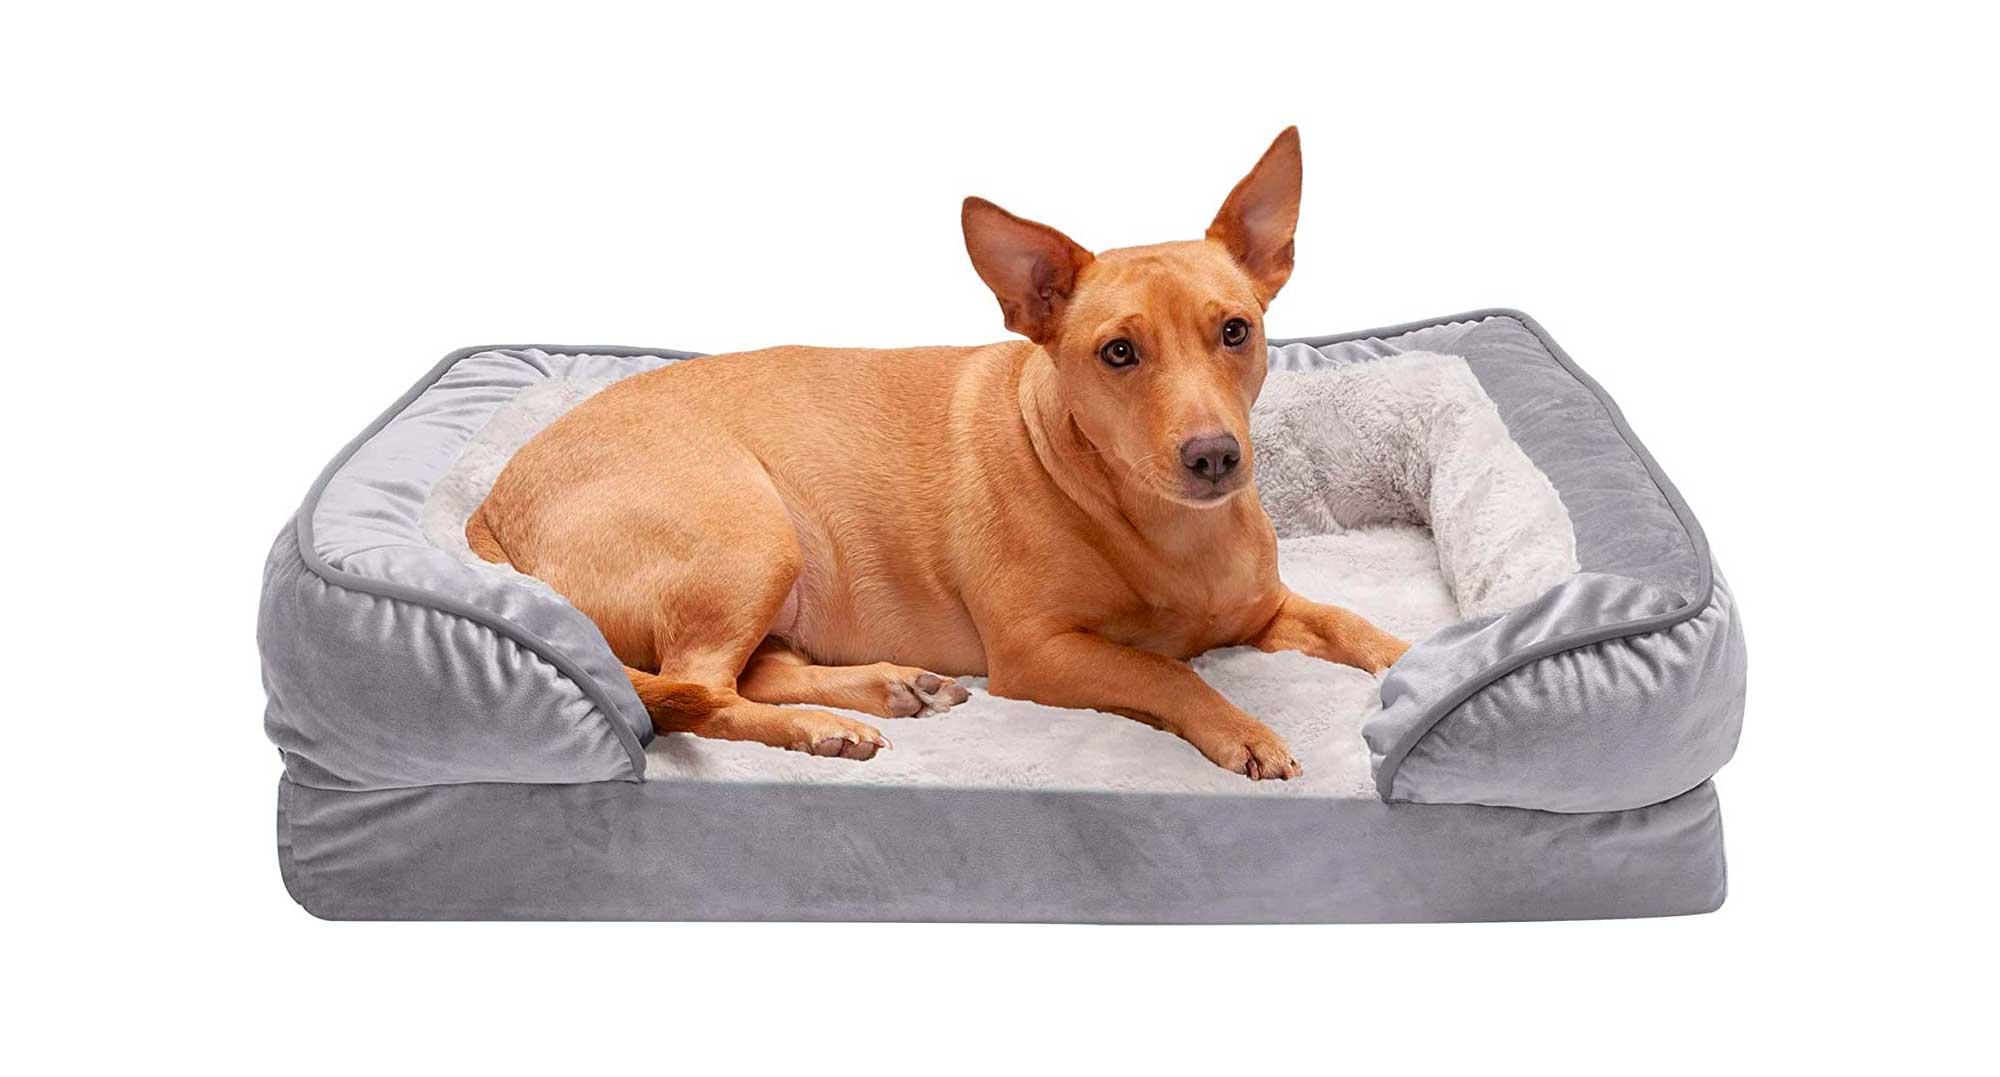 Furhaven Pet - Plush Orthopedic Sofa, Ergonomic Contour Mattress